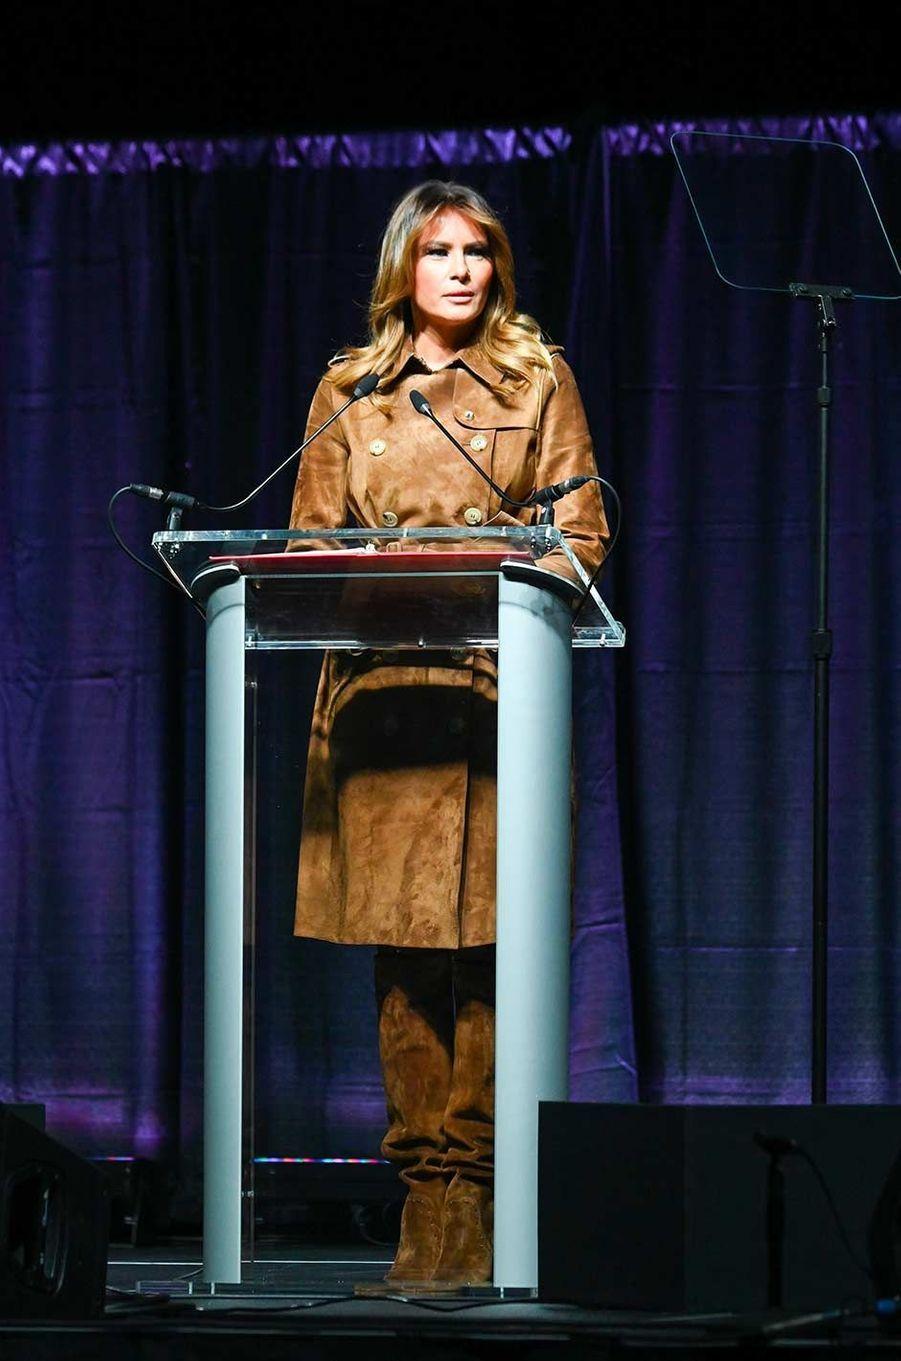 Melania Trump à Baltimore, le 26 novembre 2019.